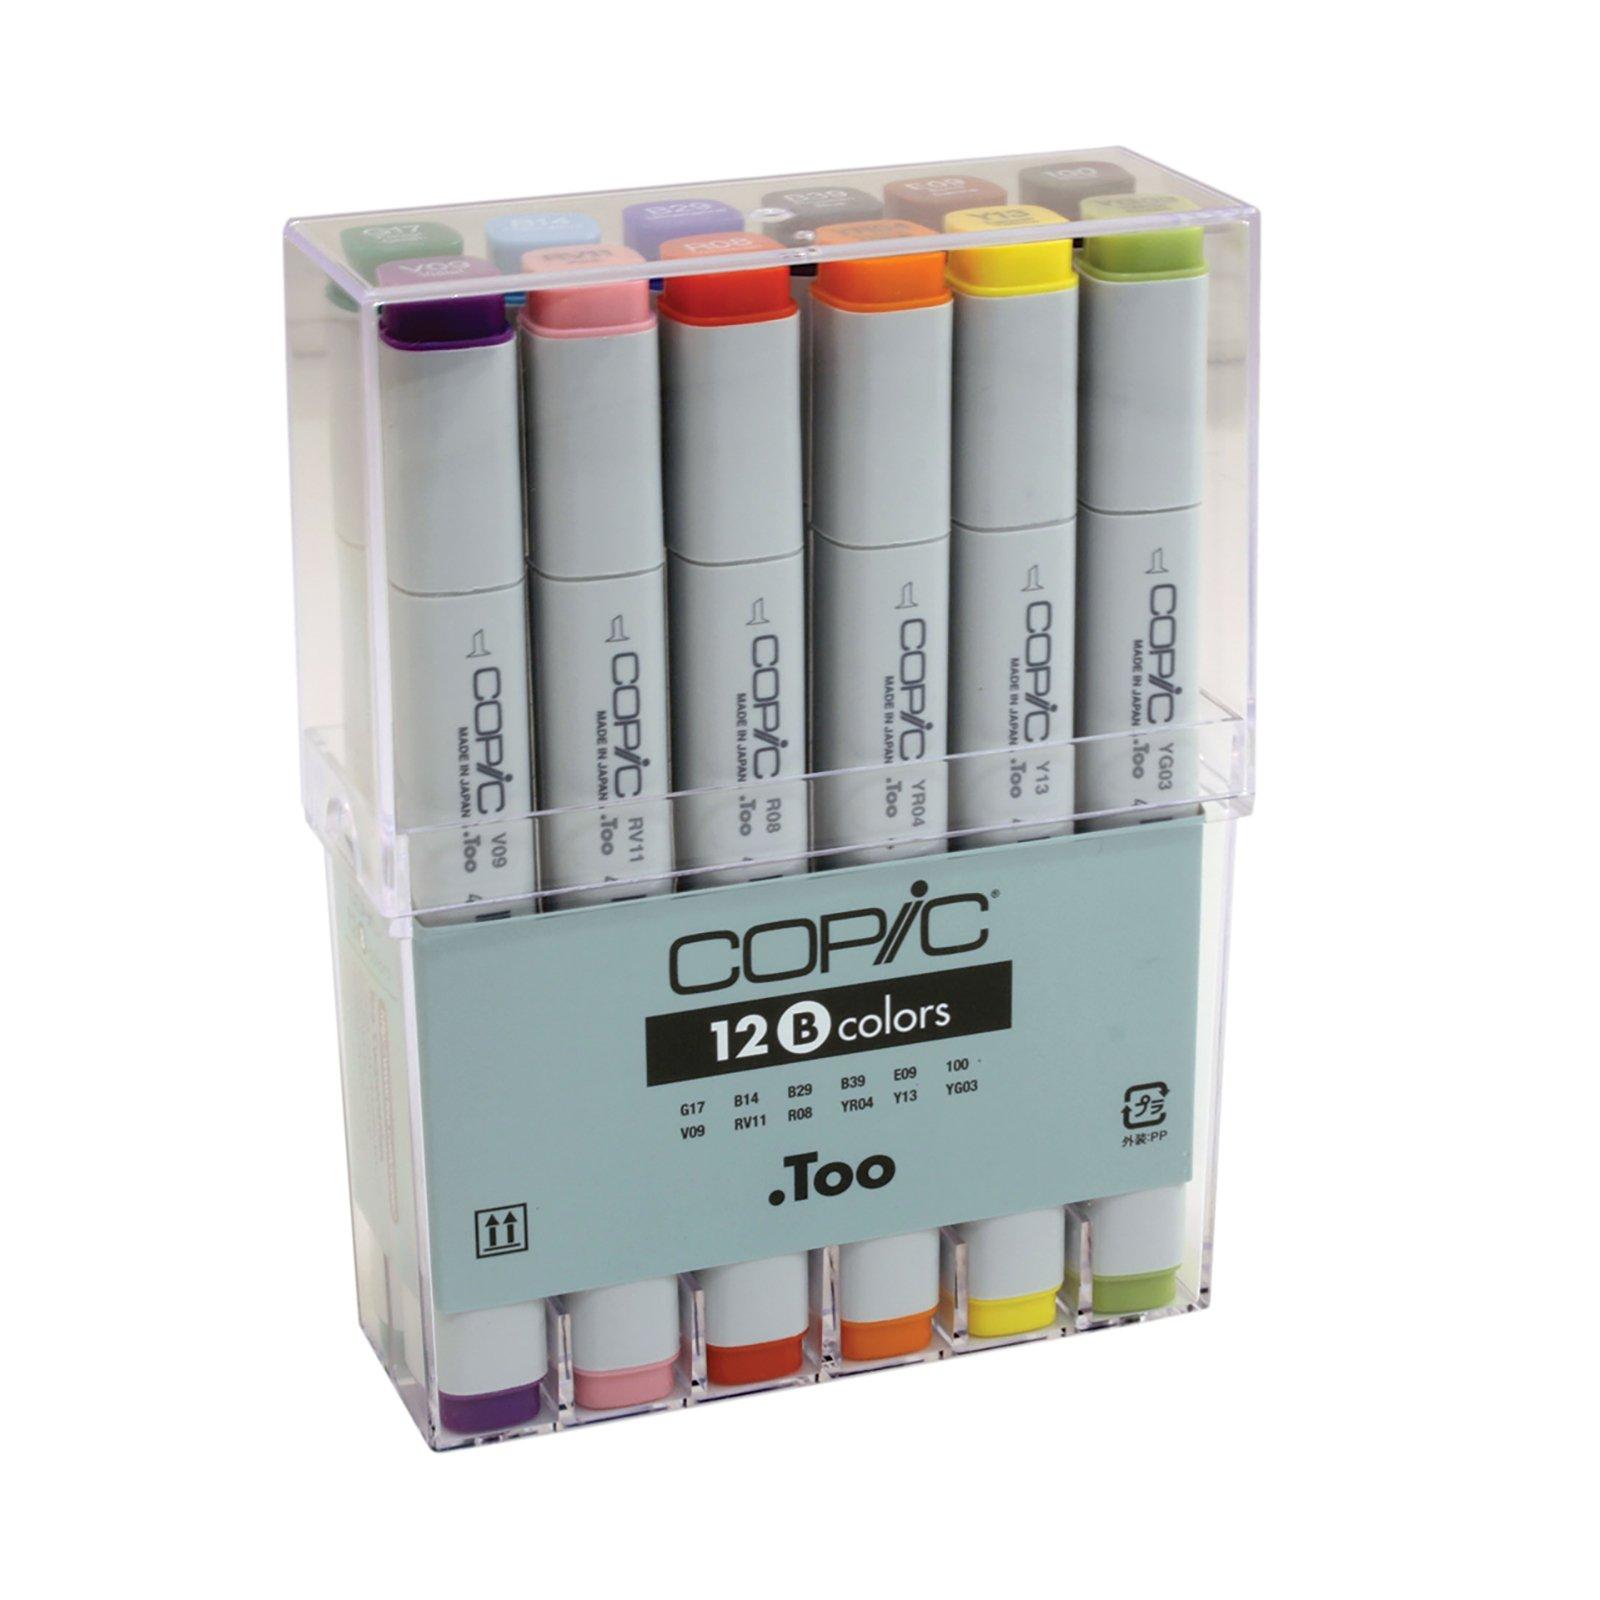 Copic Markers fibras de colores basicos set de 12